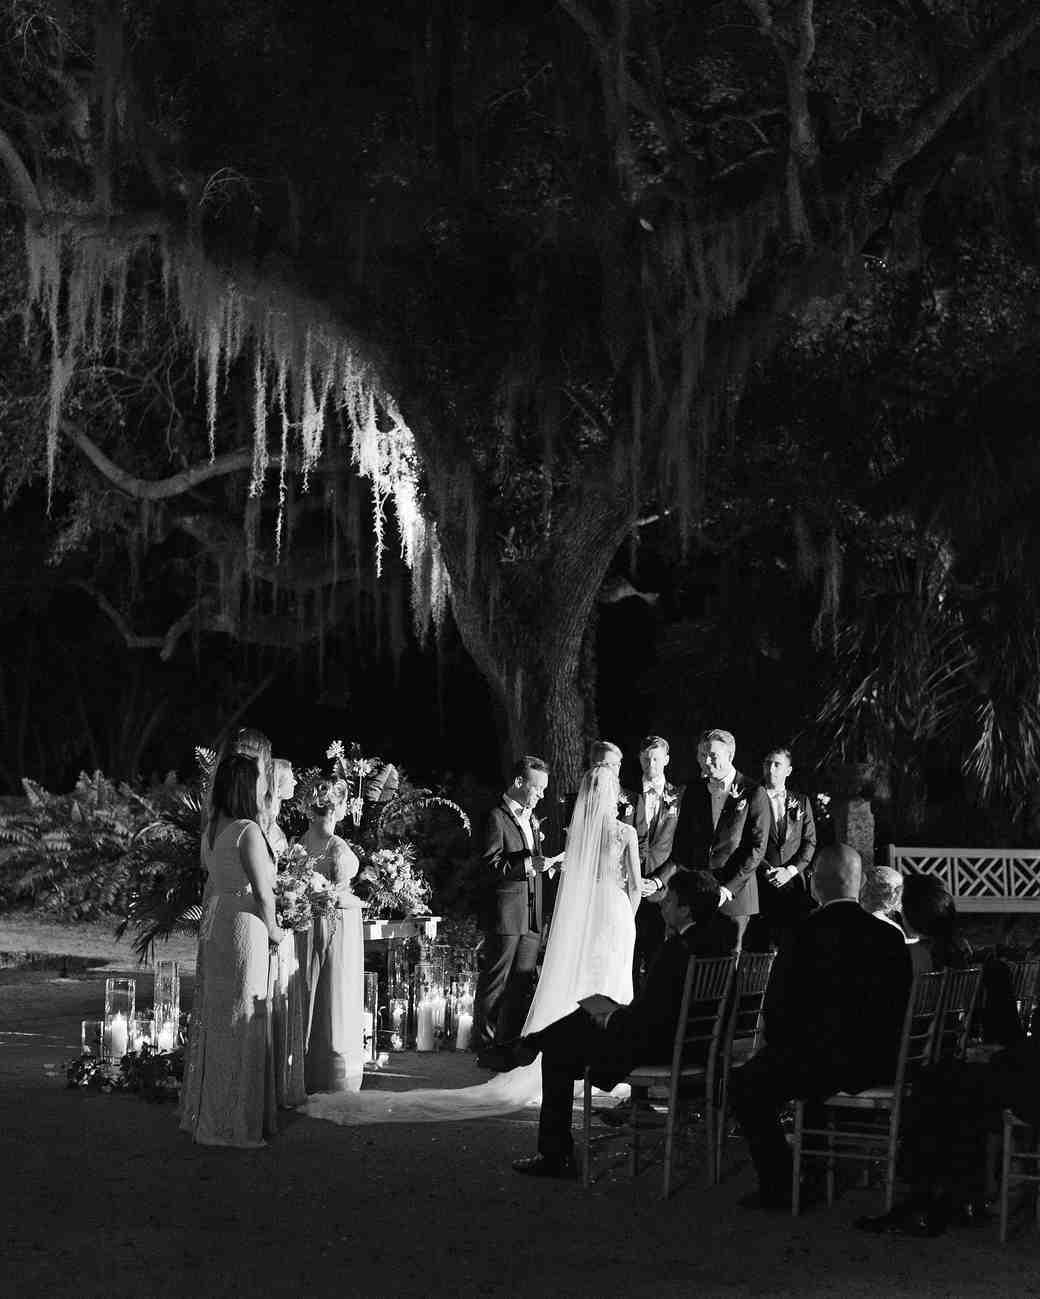 brette patrick wedding ceremony evening